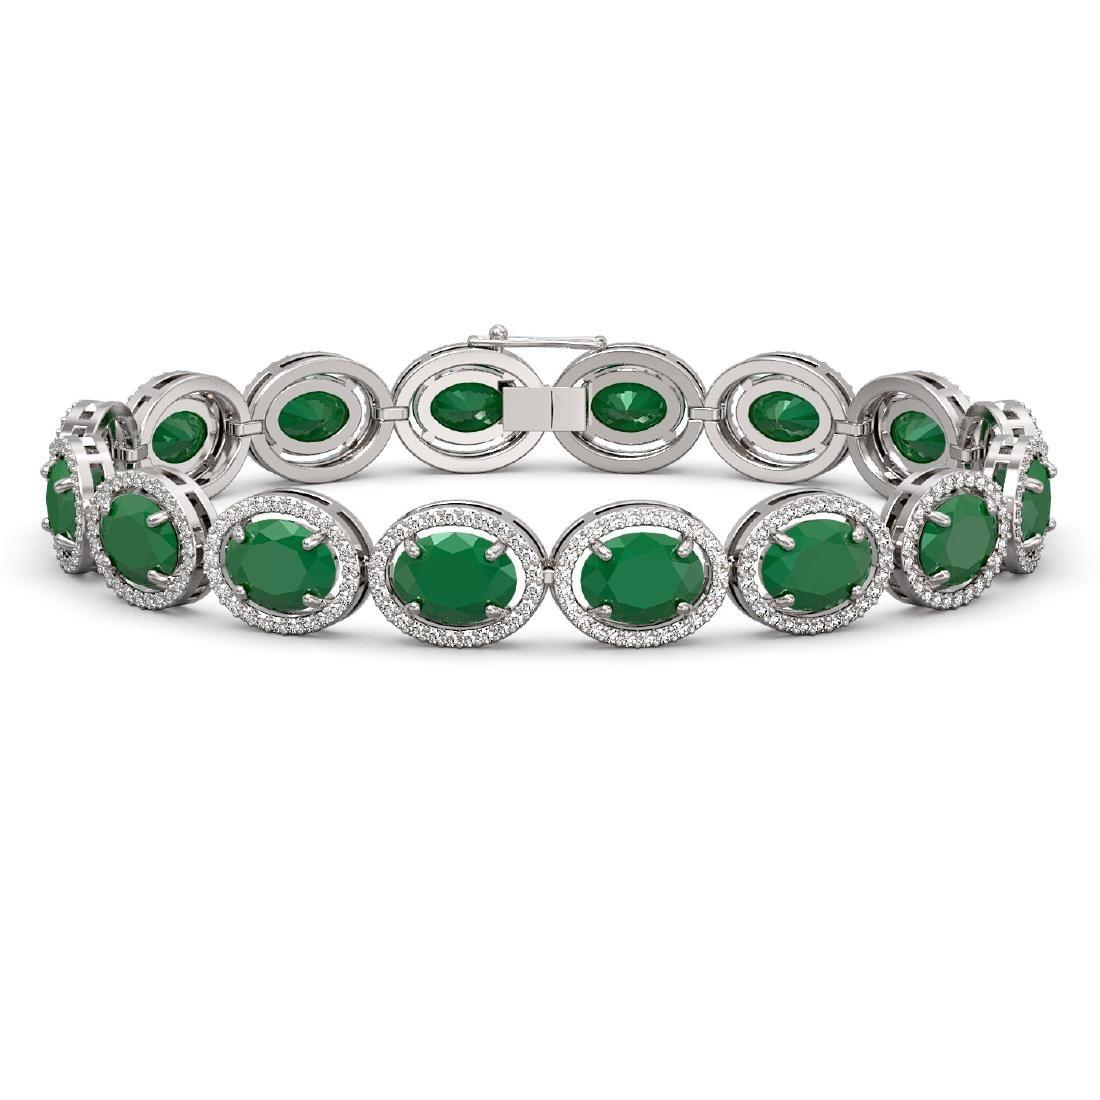 3179 CTW Emerald Diamond Halo Bracelet 10K White